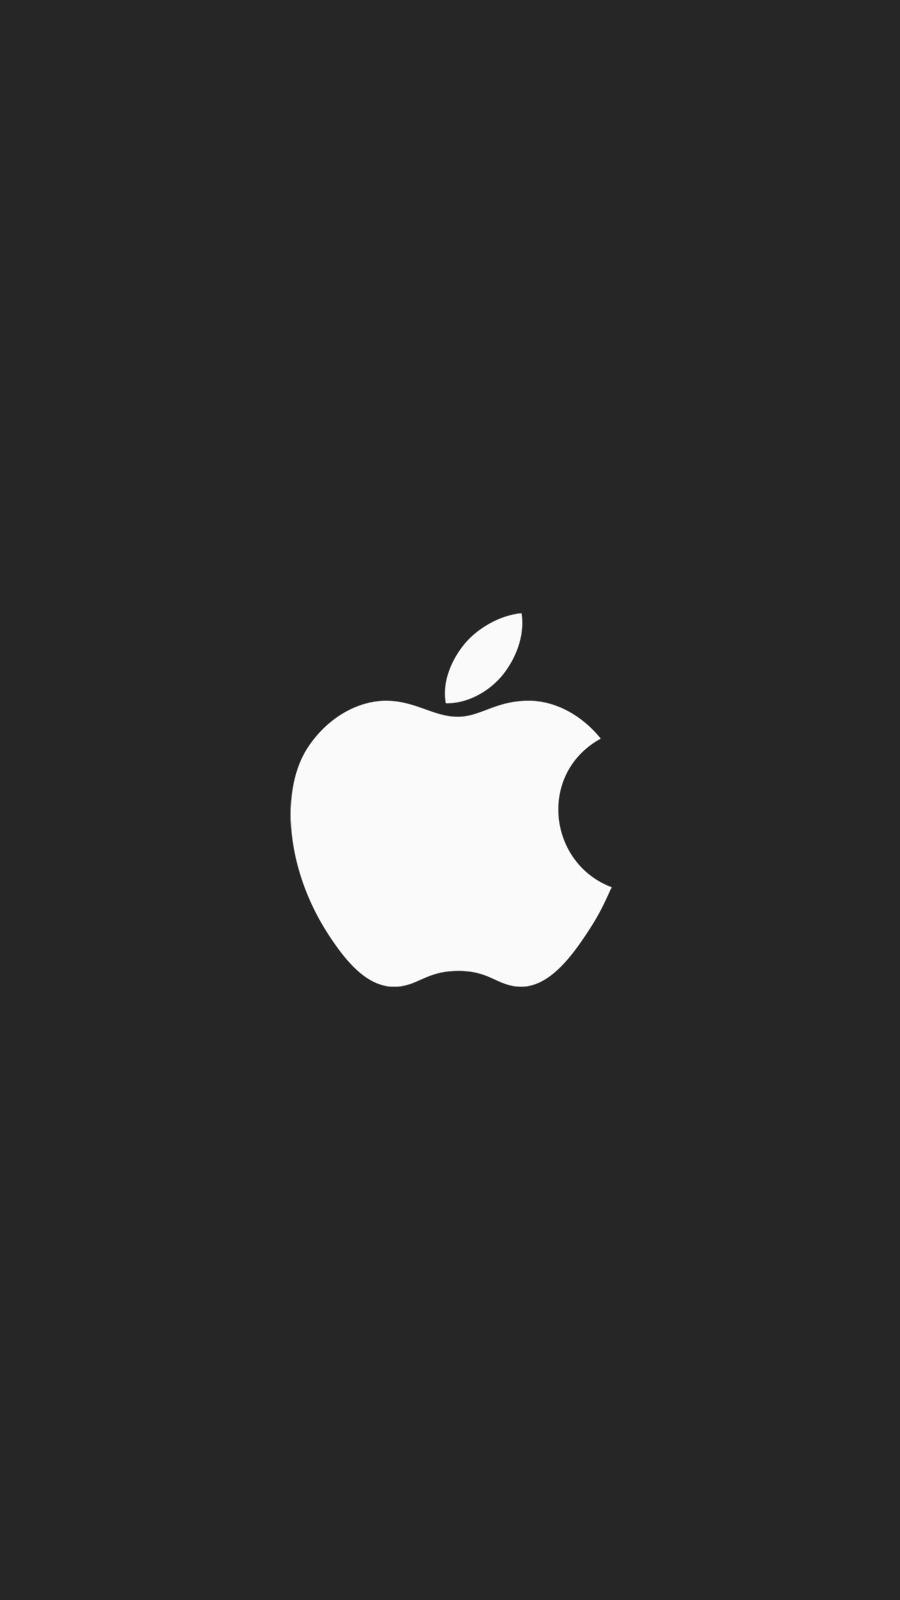 Apple minimal logo black iPhone Wallpaper iphoneswallpapers com